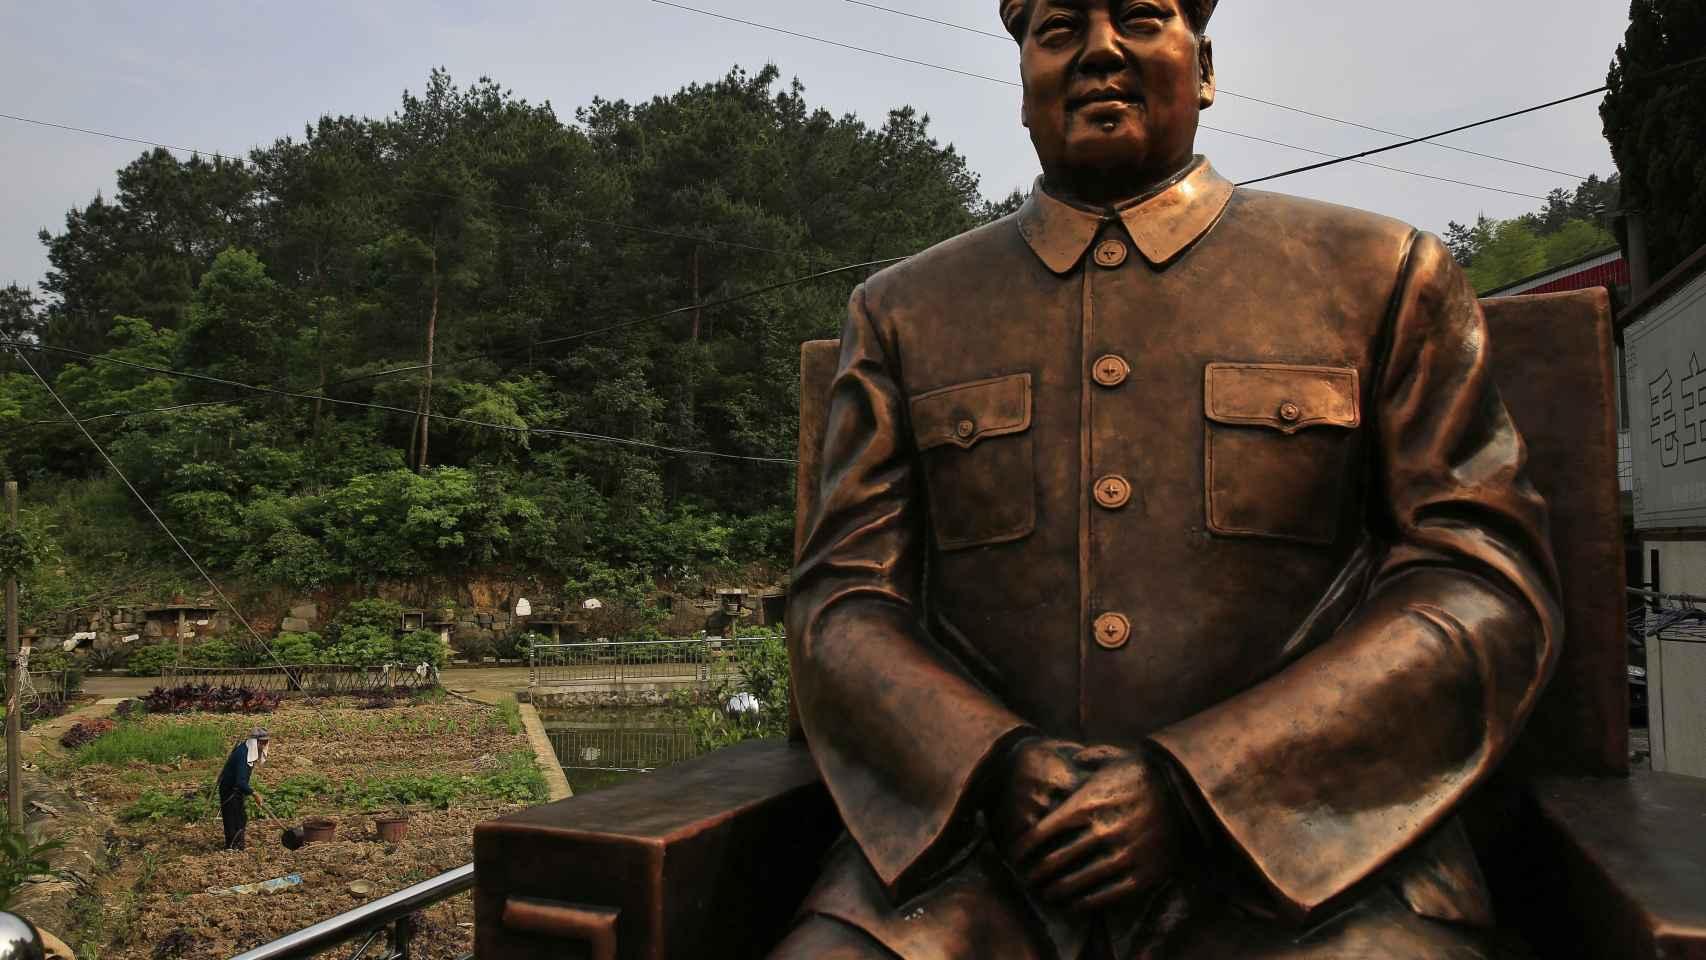 Mao Zedong en la China del siglo XXI